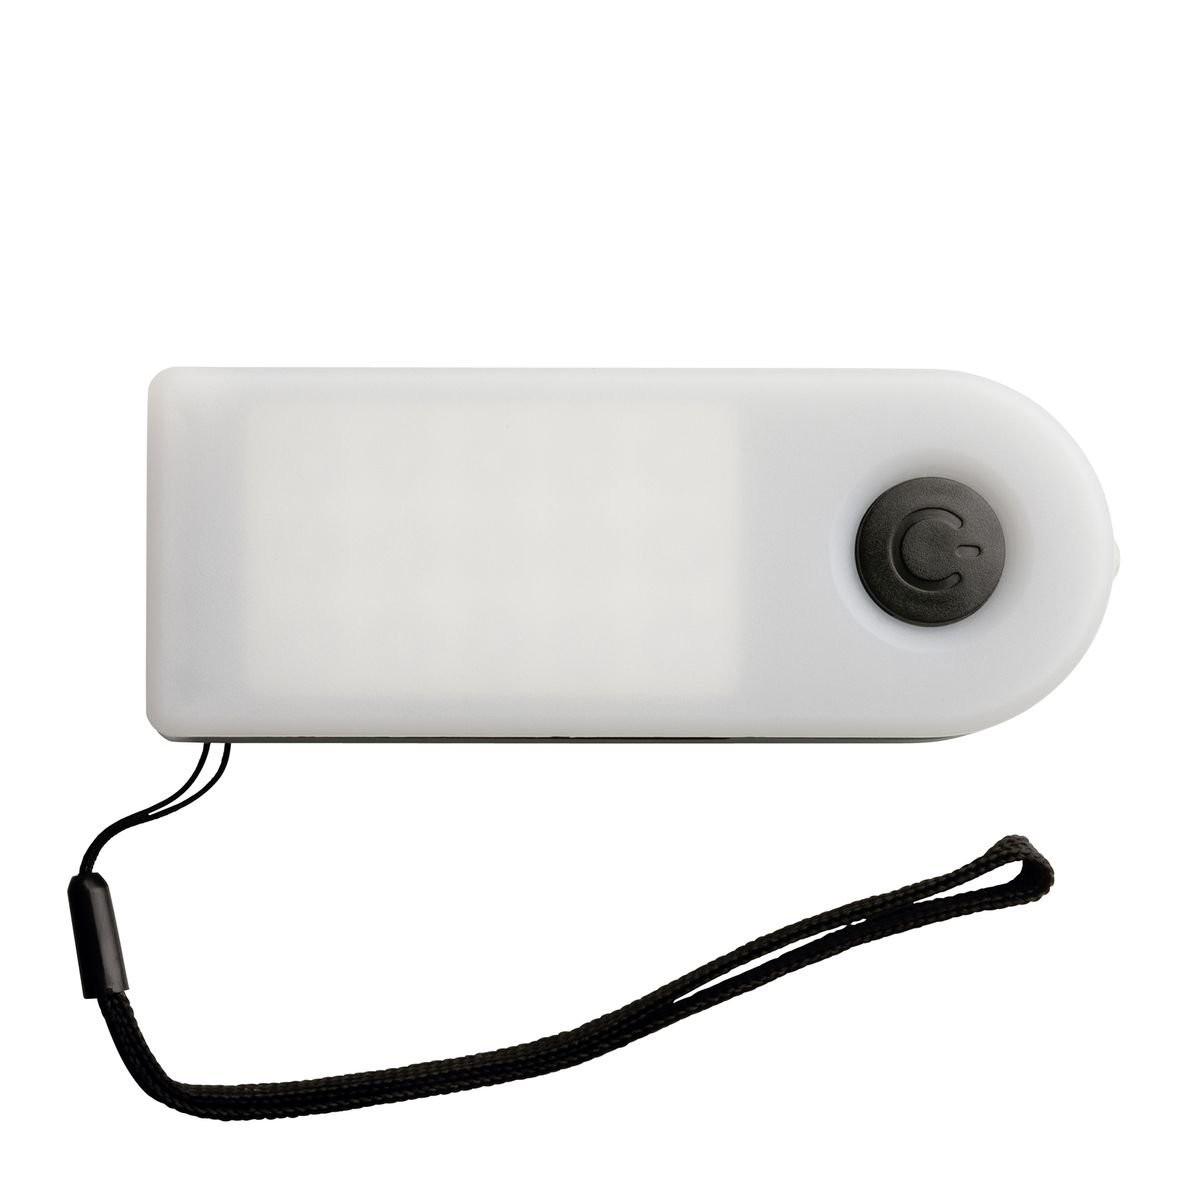 LED Taschenlampe REFLECTS-KEMI WHITE, Ansicht 6